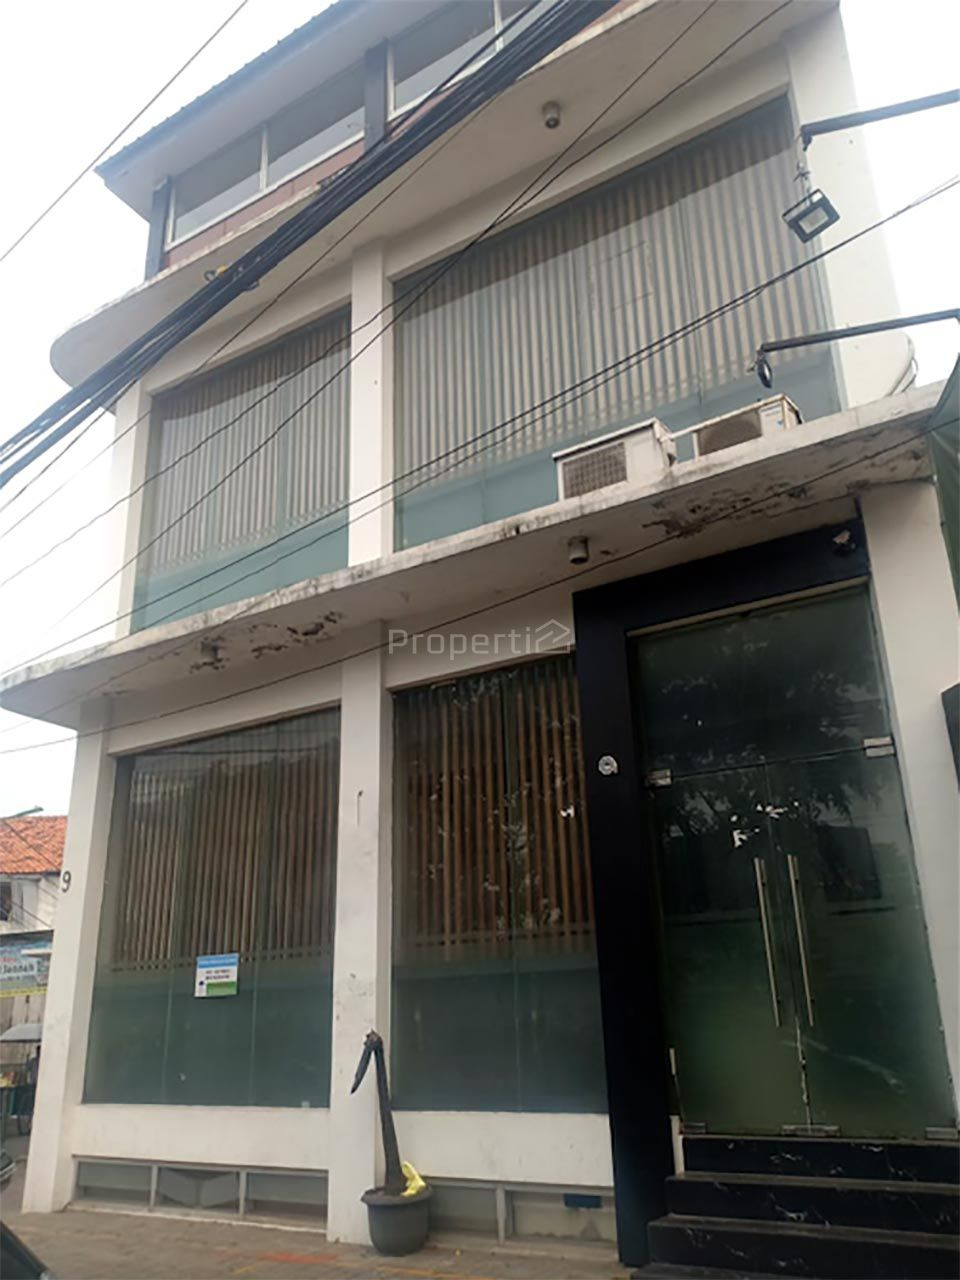 Gedung Strategis di Kebon Jeruk, DKI Jakarta